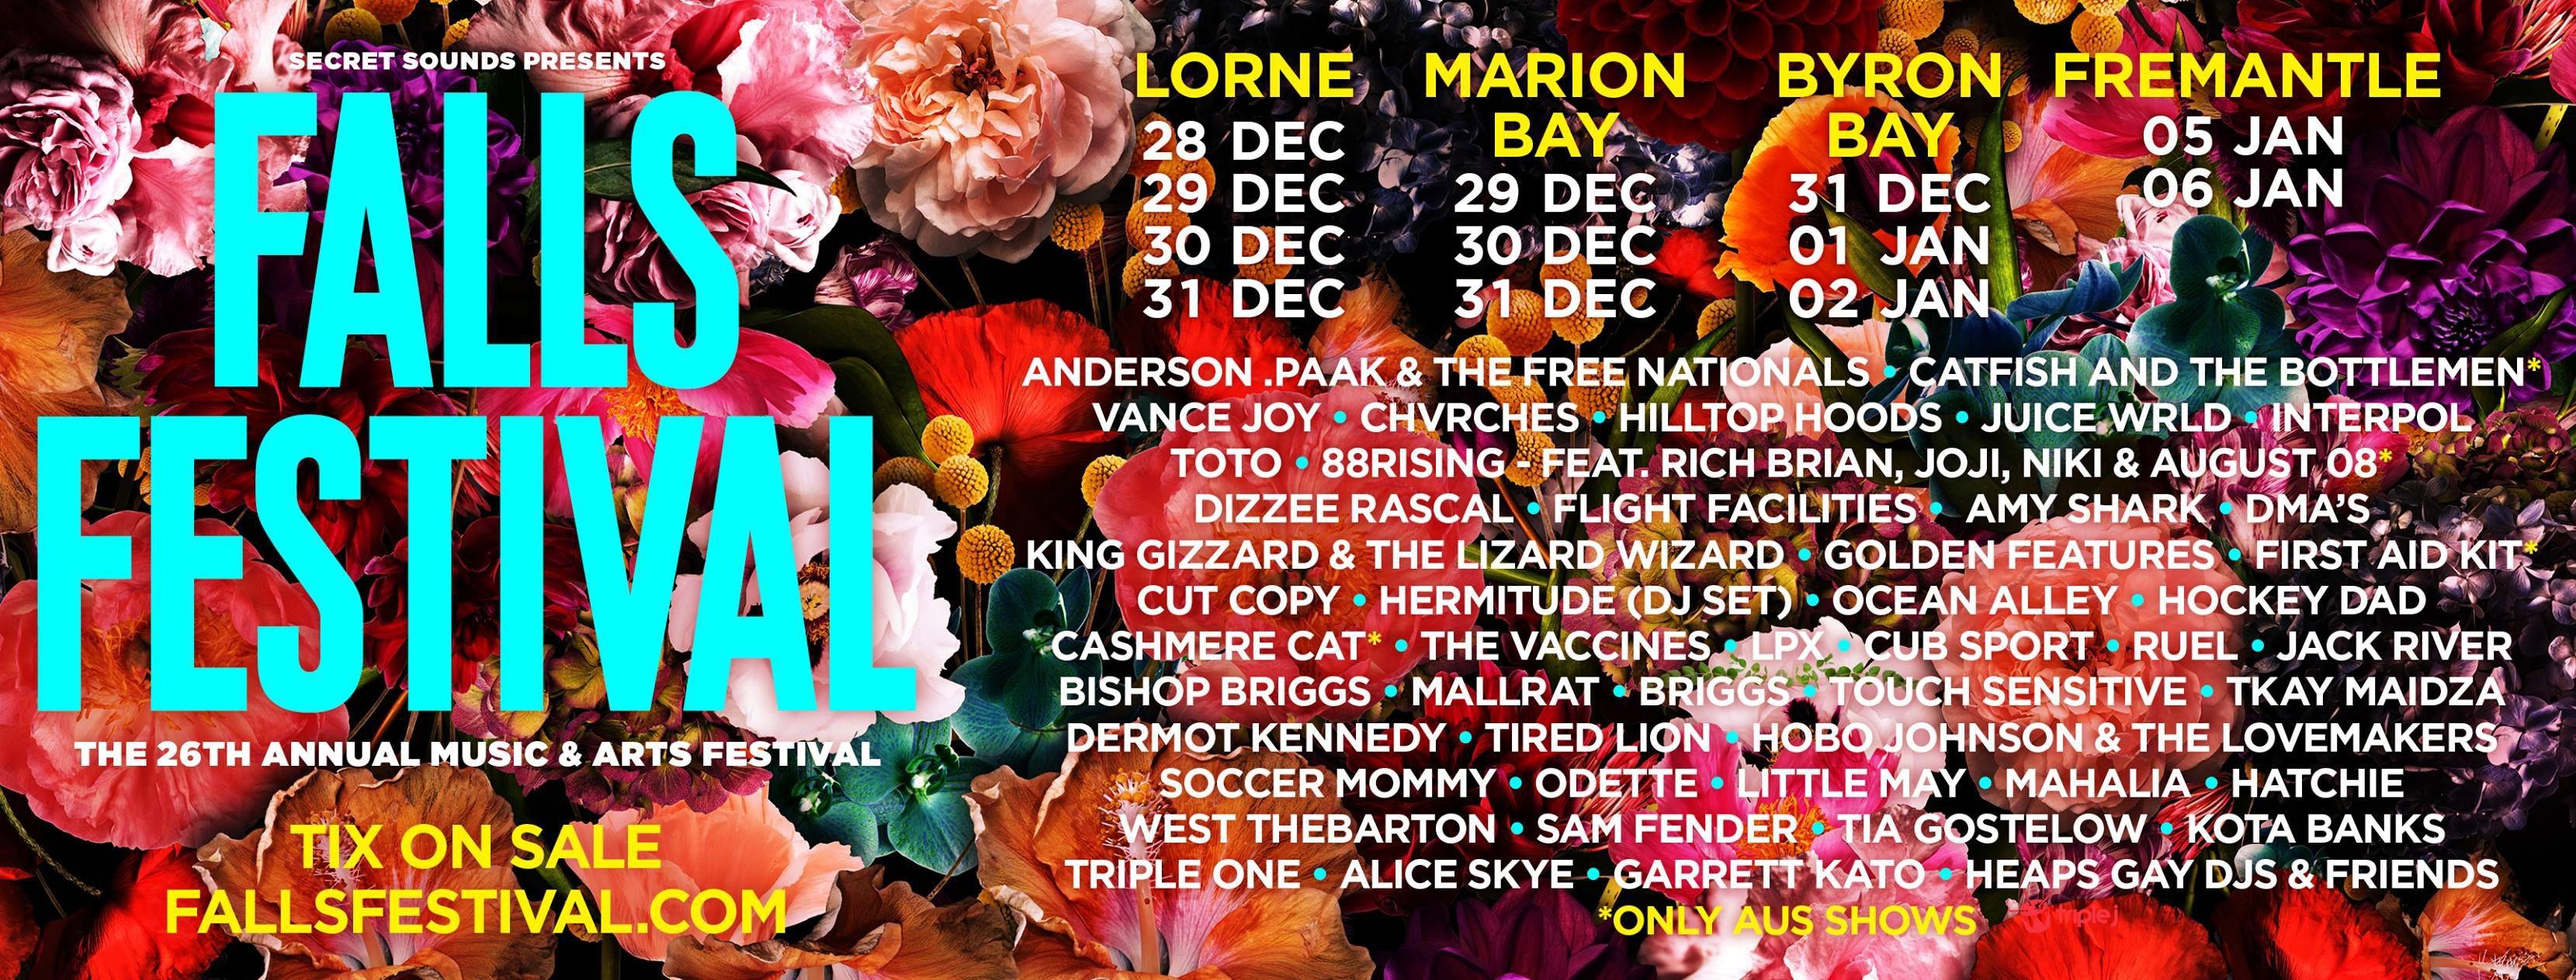 March 2019 Calendar Sri Lanka Más Arriba-a-fecha 30 Music Festivals In Australia to Experience before You Die Of March 2019 Calendar Sri Lanka Más Arriba-a-fecha events City Nomads